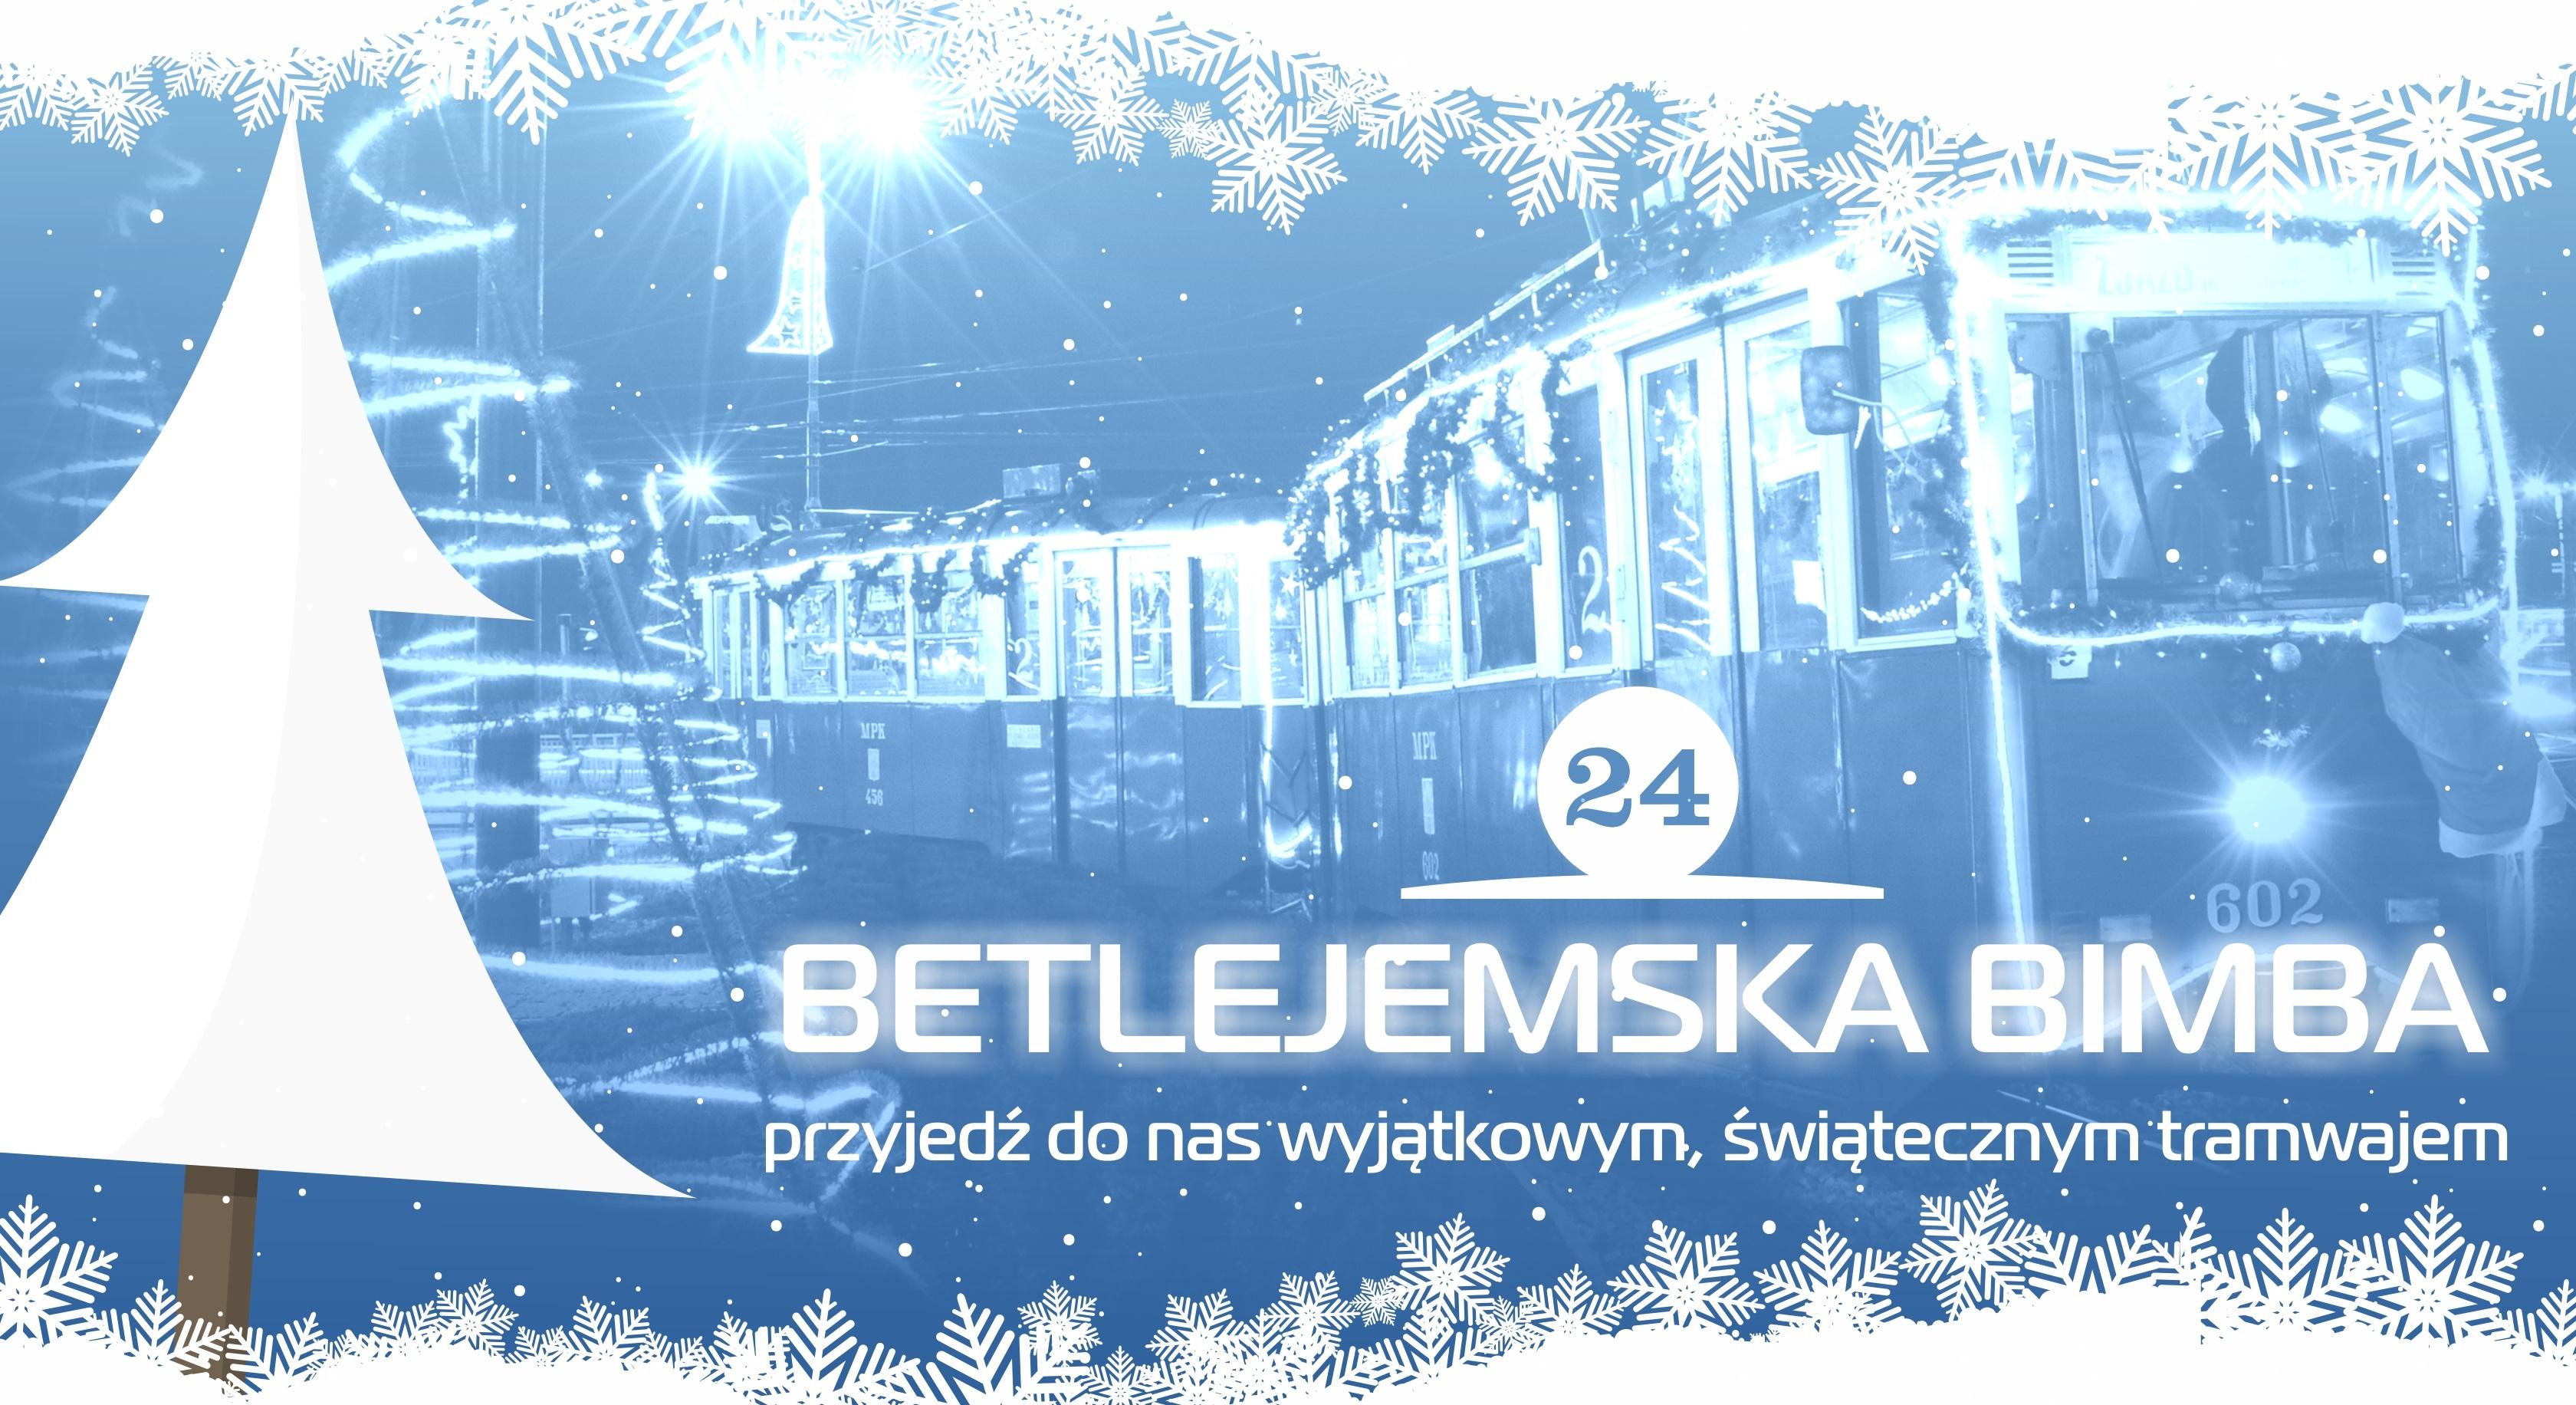 Betlejemska Bimba na Betlejem Poznańskie 2018